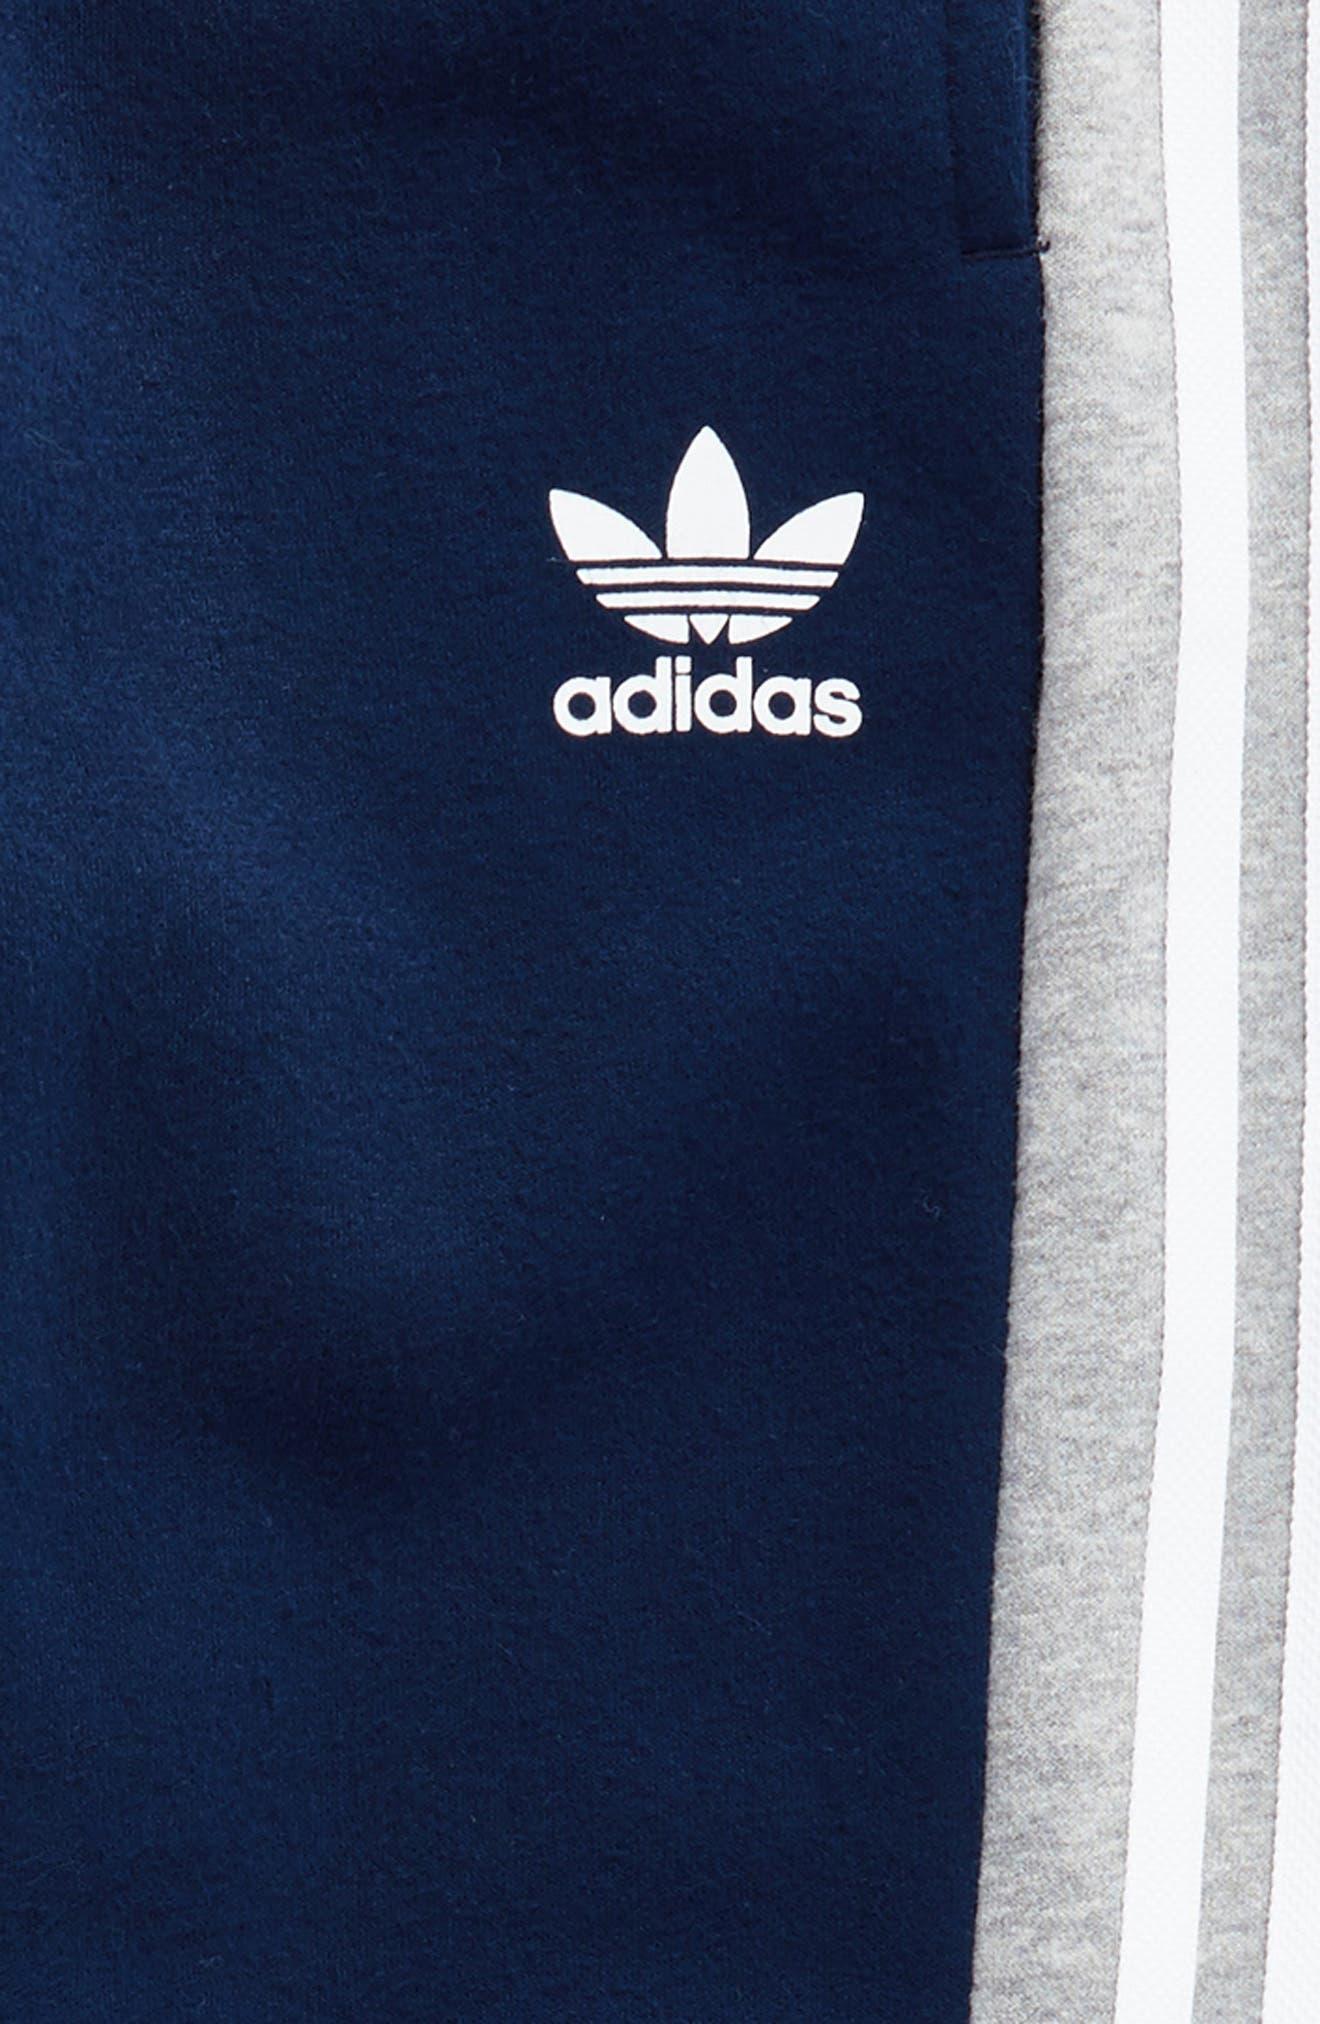 adidas FL Jogger Pants,                             Alternate thumbnail 3, color,                             Collegiate Navy/ Medium Grey